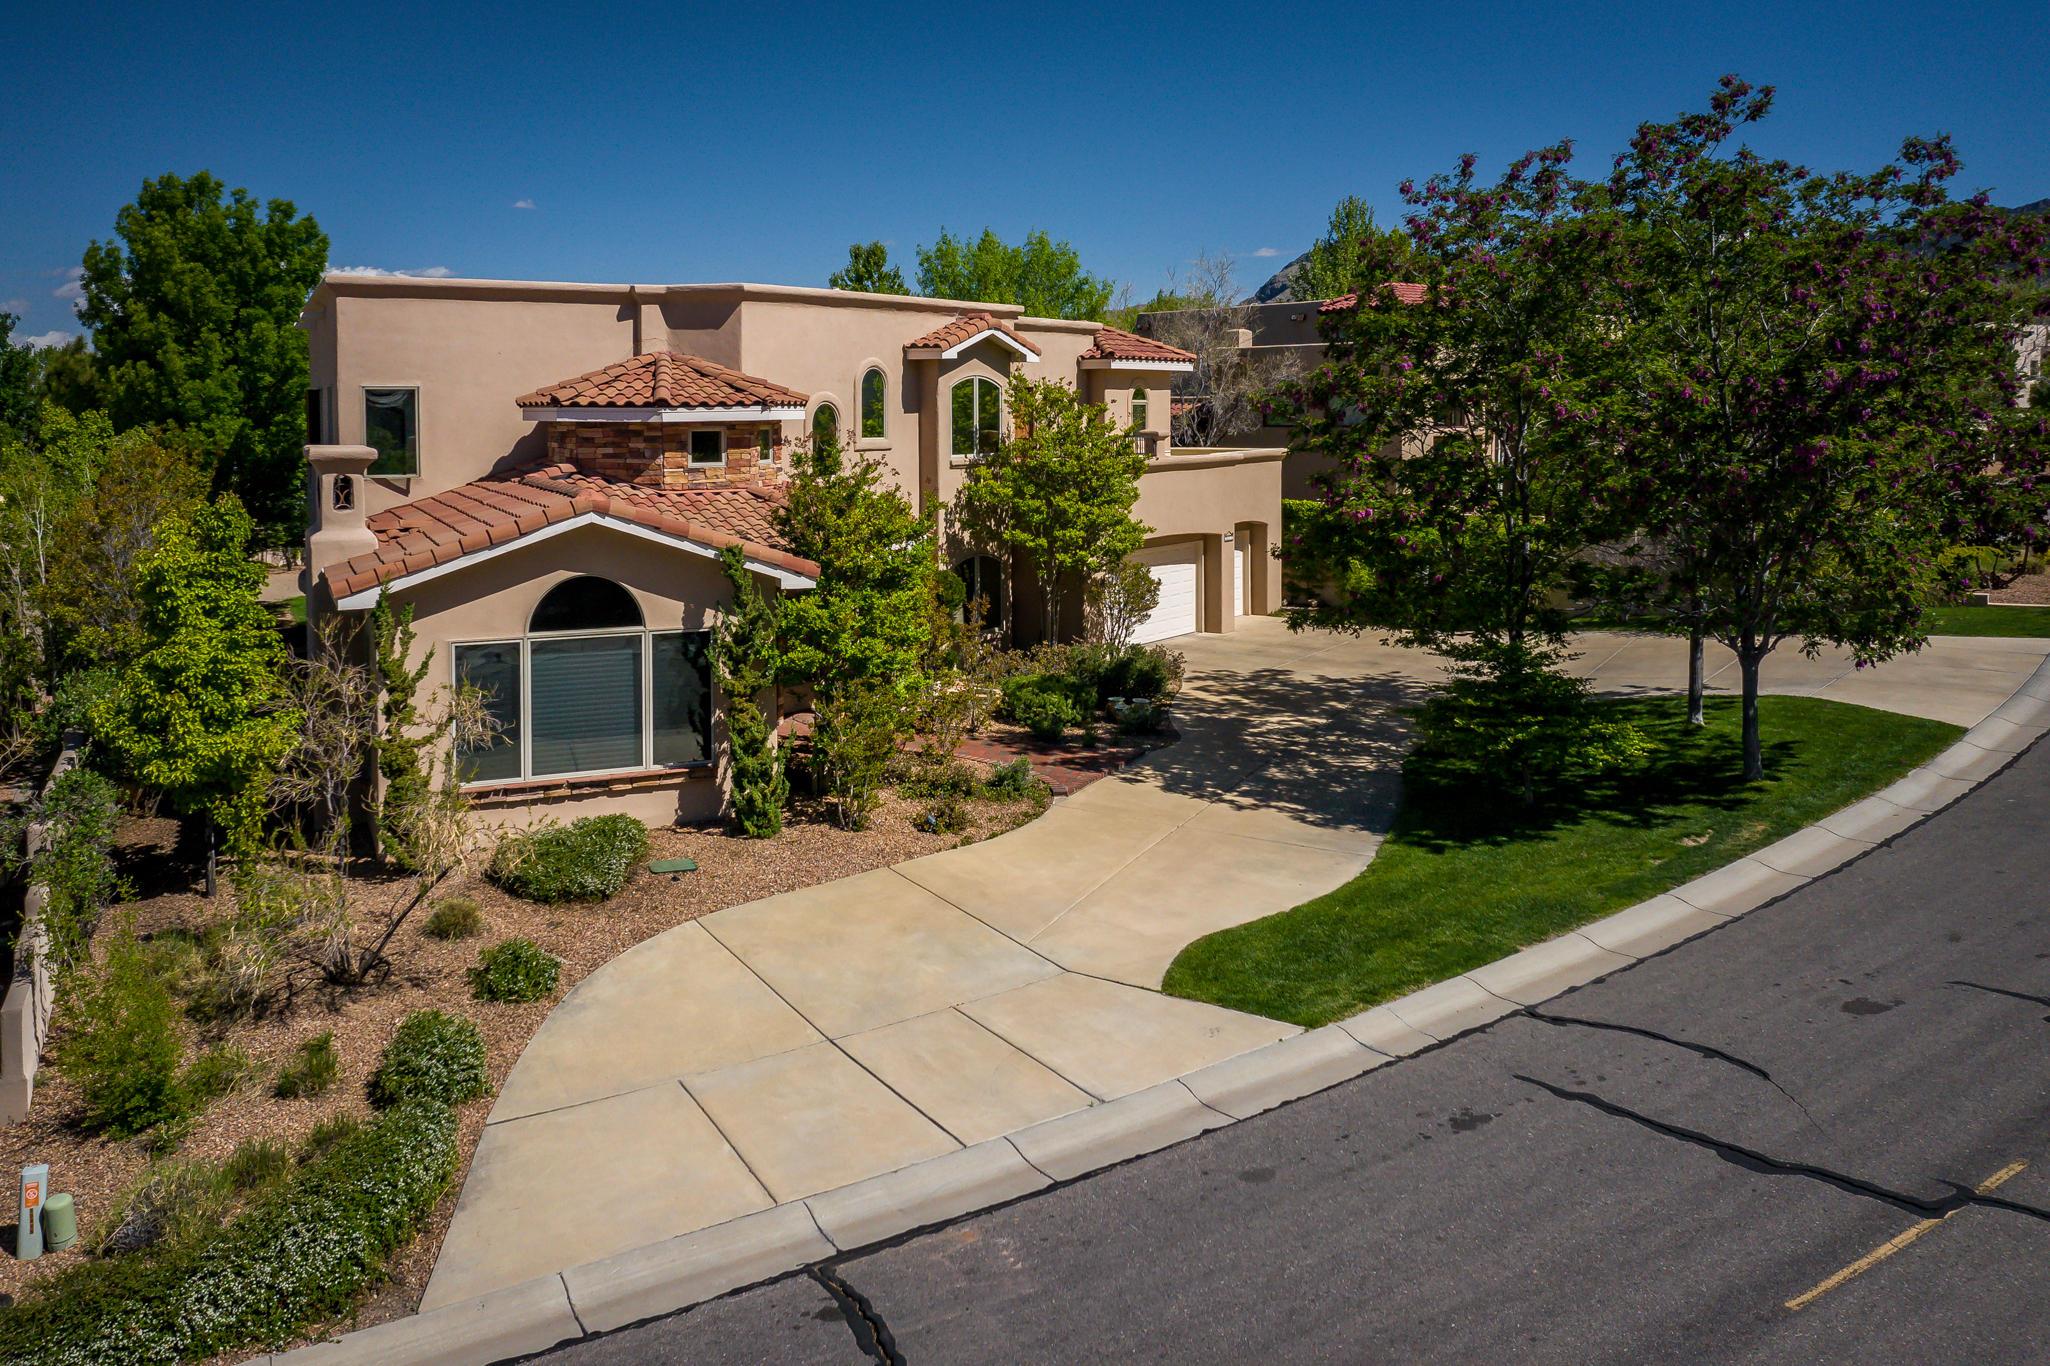 12415 SCARLET GEM Court NE, Albuquerque, NM 87122 - Albuquerque, NM real estate listing